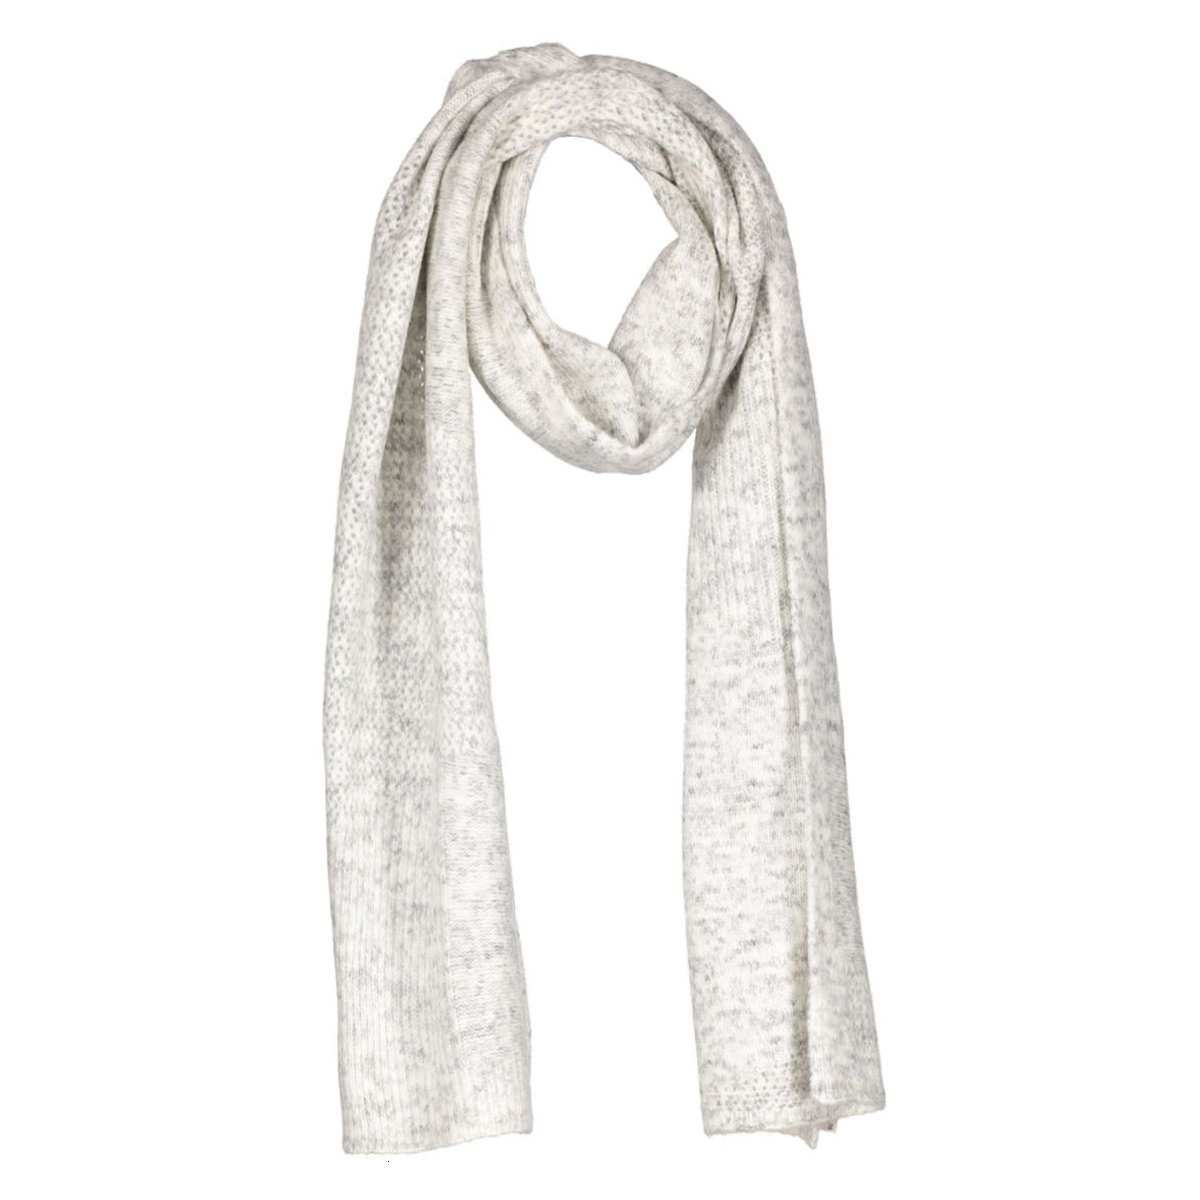 v60331 garcia sjaal 342 lgt grey